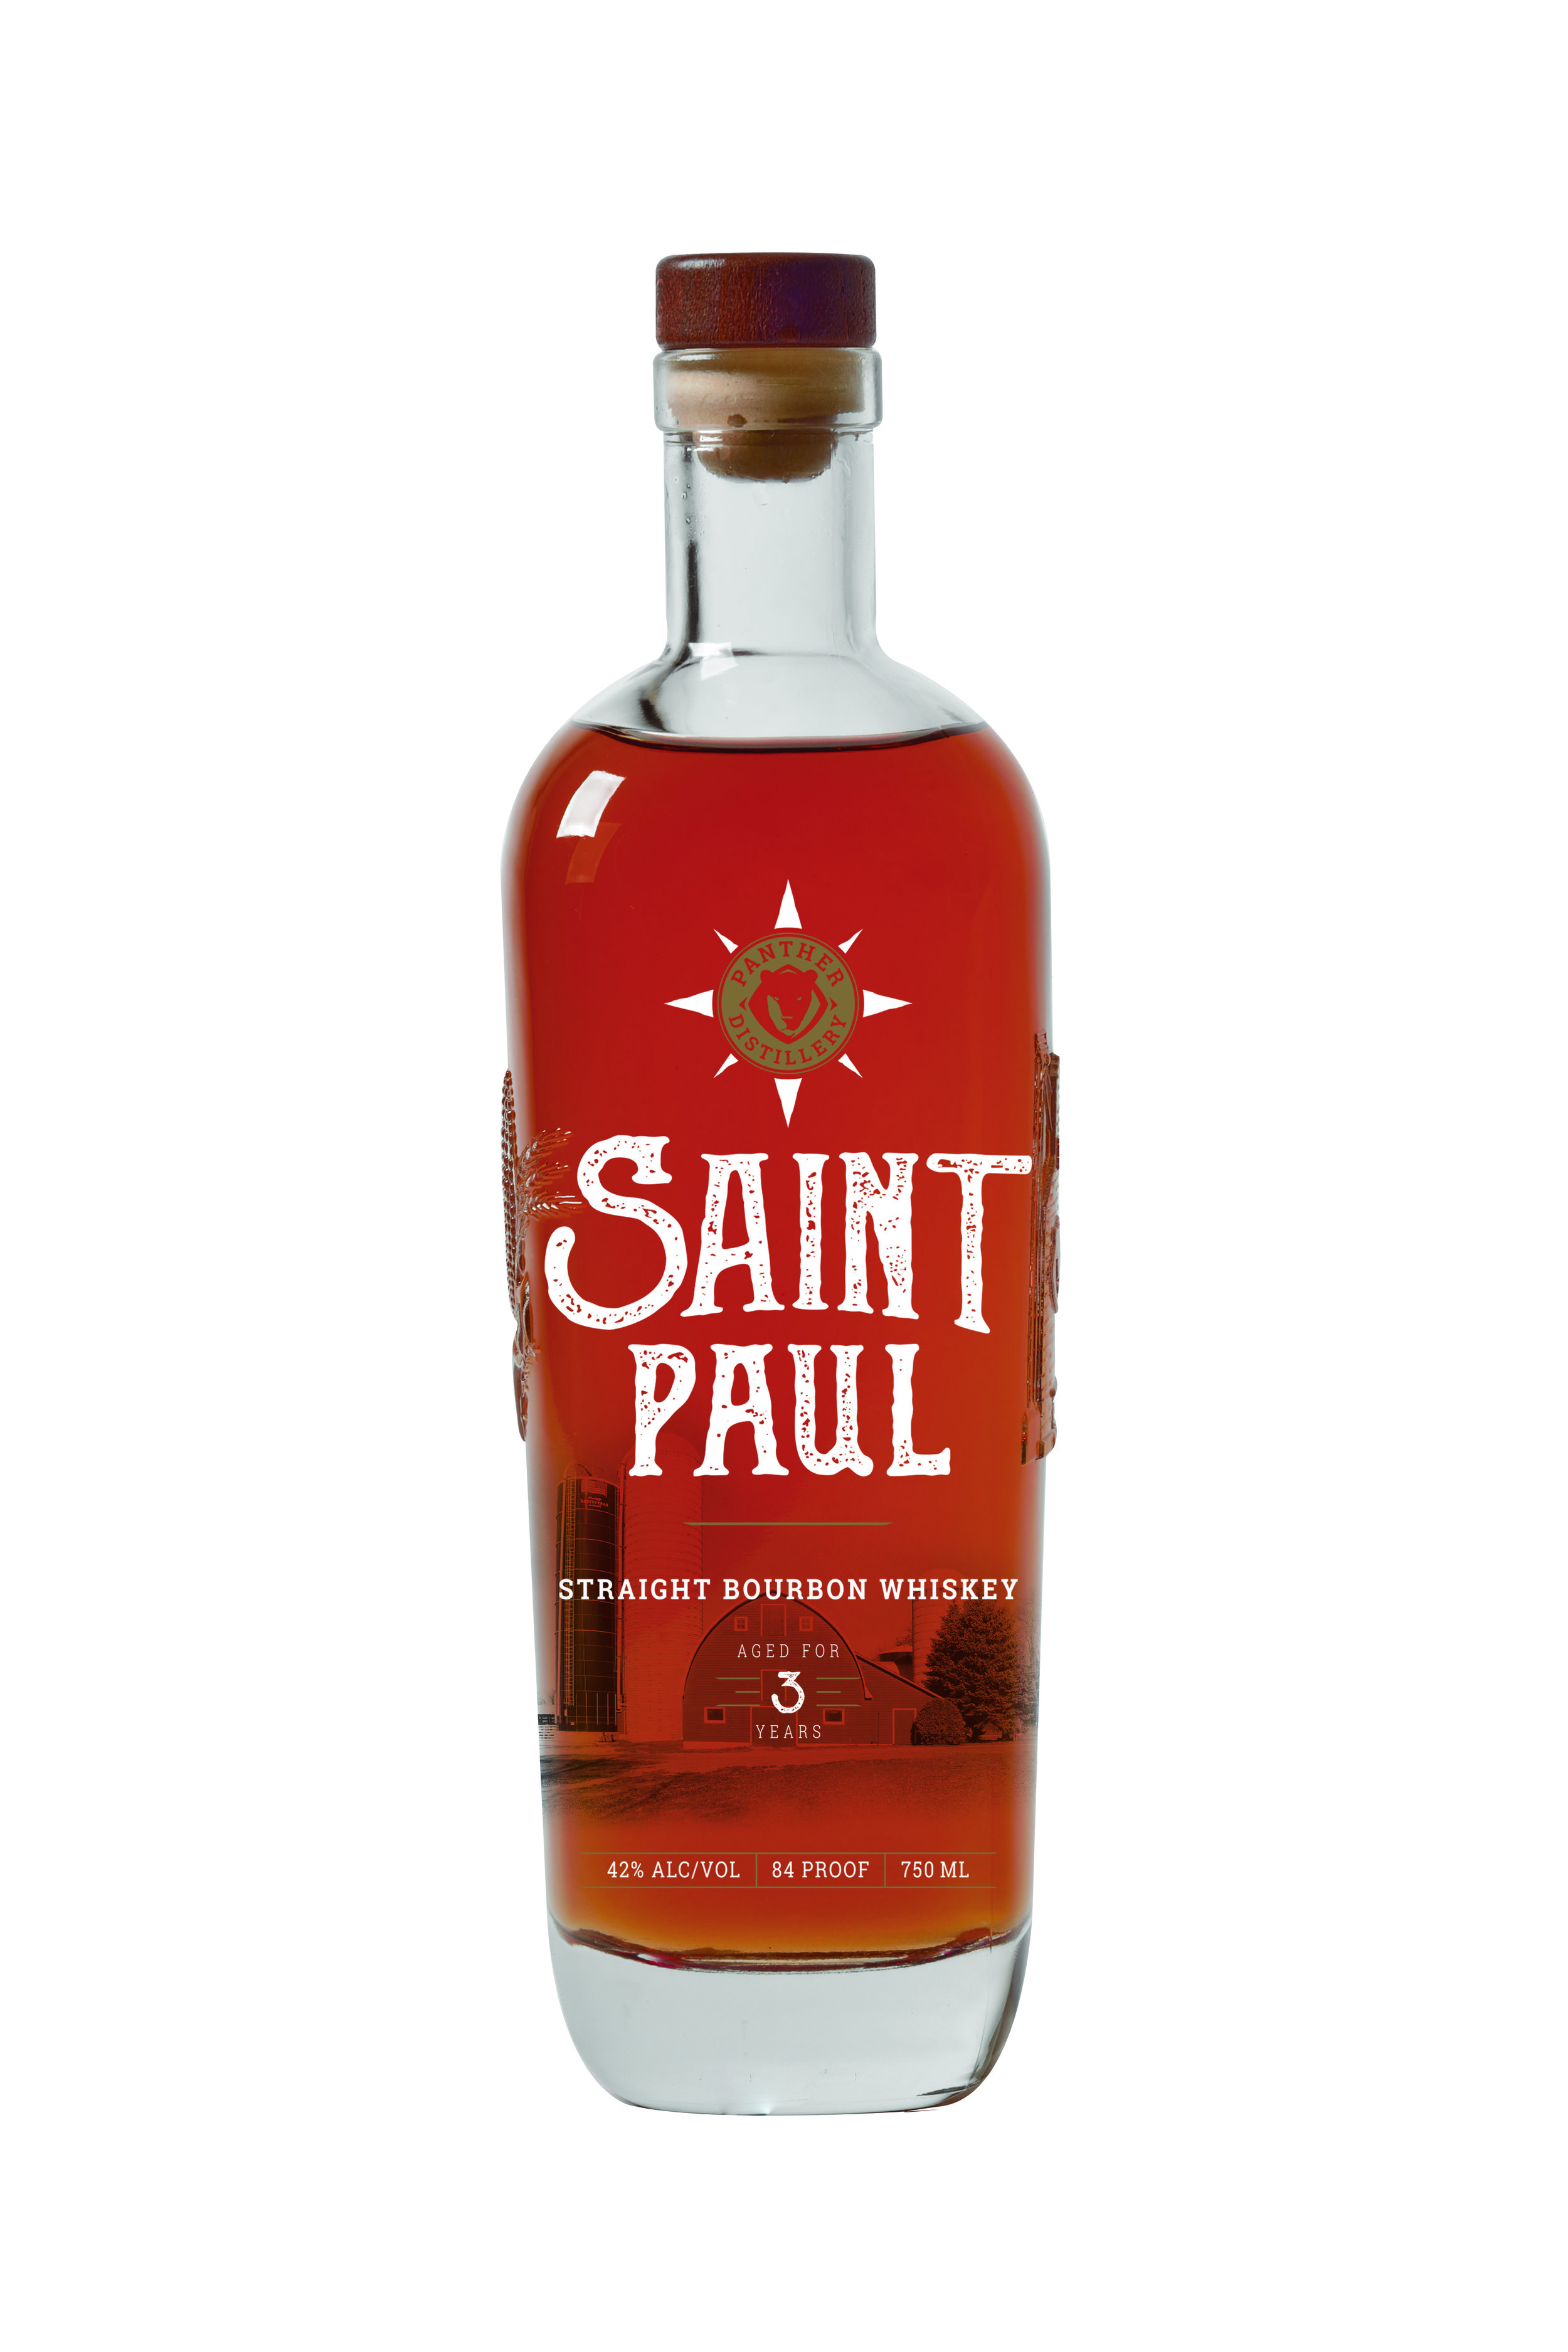 Saint Paul Bourbon Panther Distillery